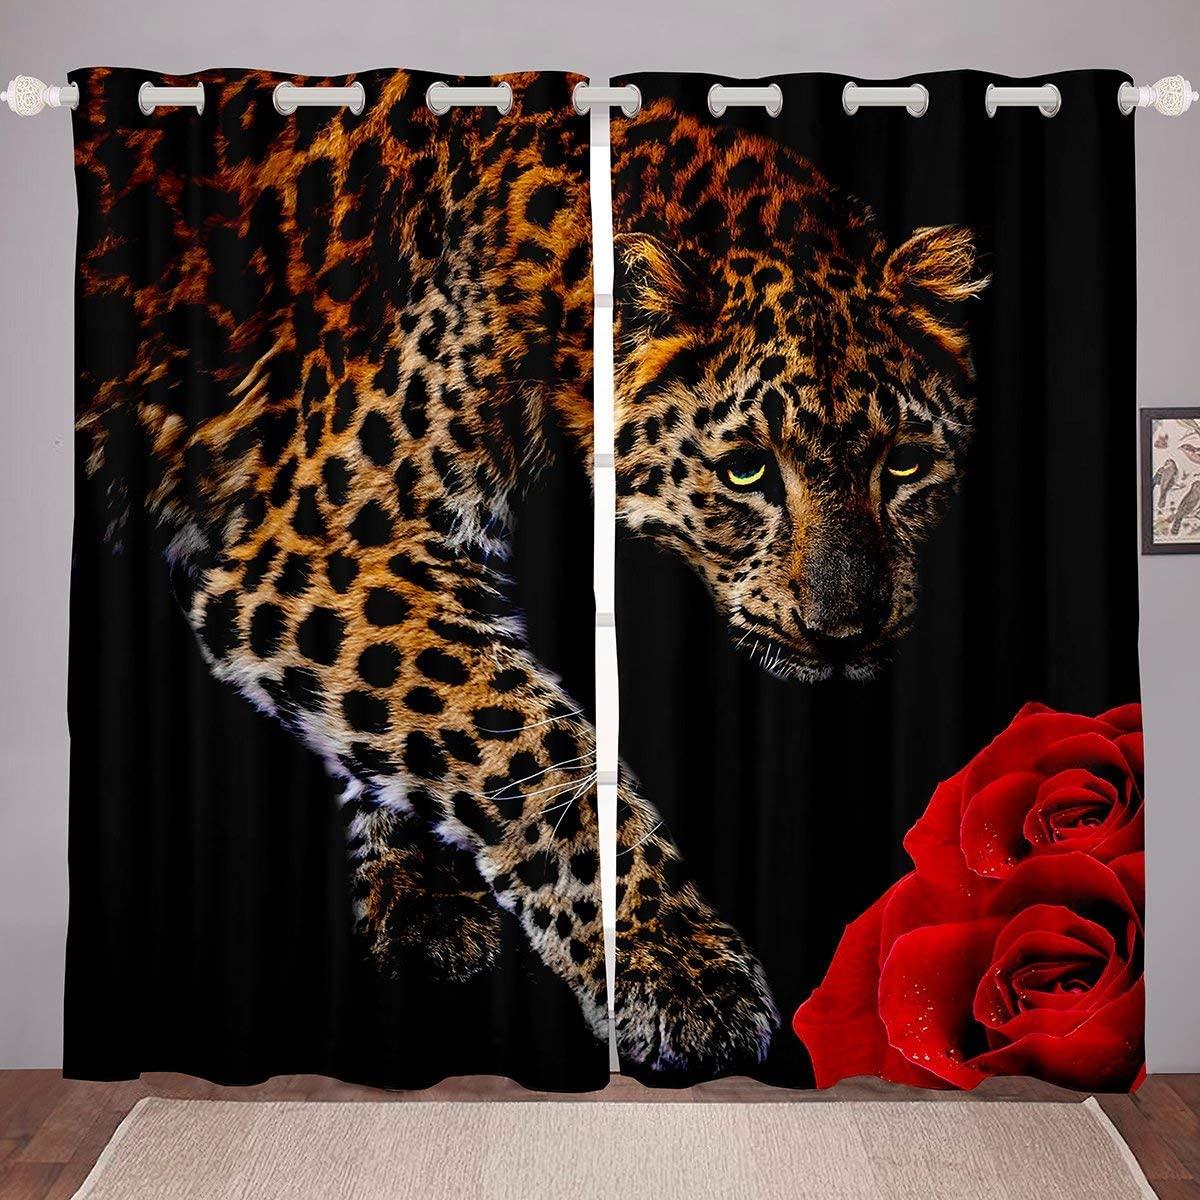 Erosebridal Leopard Window Curtains,Cheetah Curtain for Adult,Leopard Print Window Treatments Rose Flower Window Drapes African Savanna Animal Fashion Dorm Bedroom Decor 42